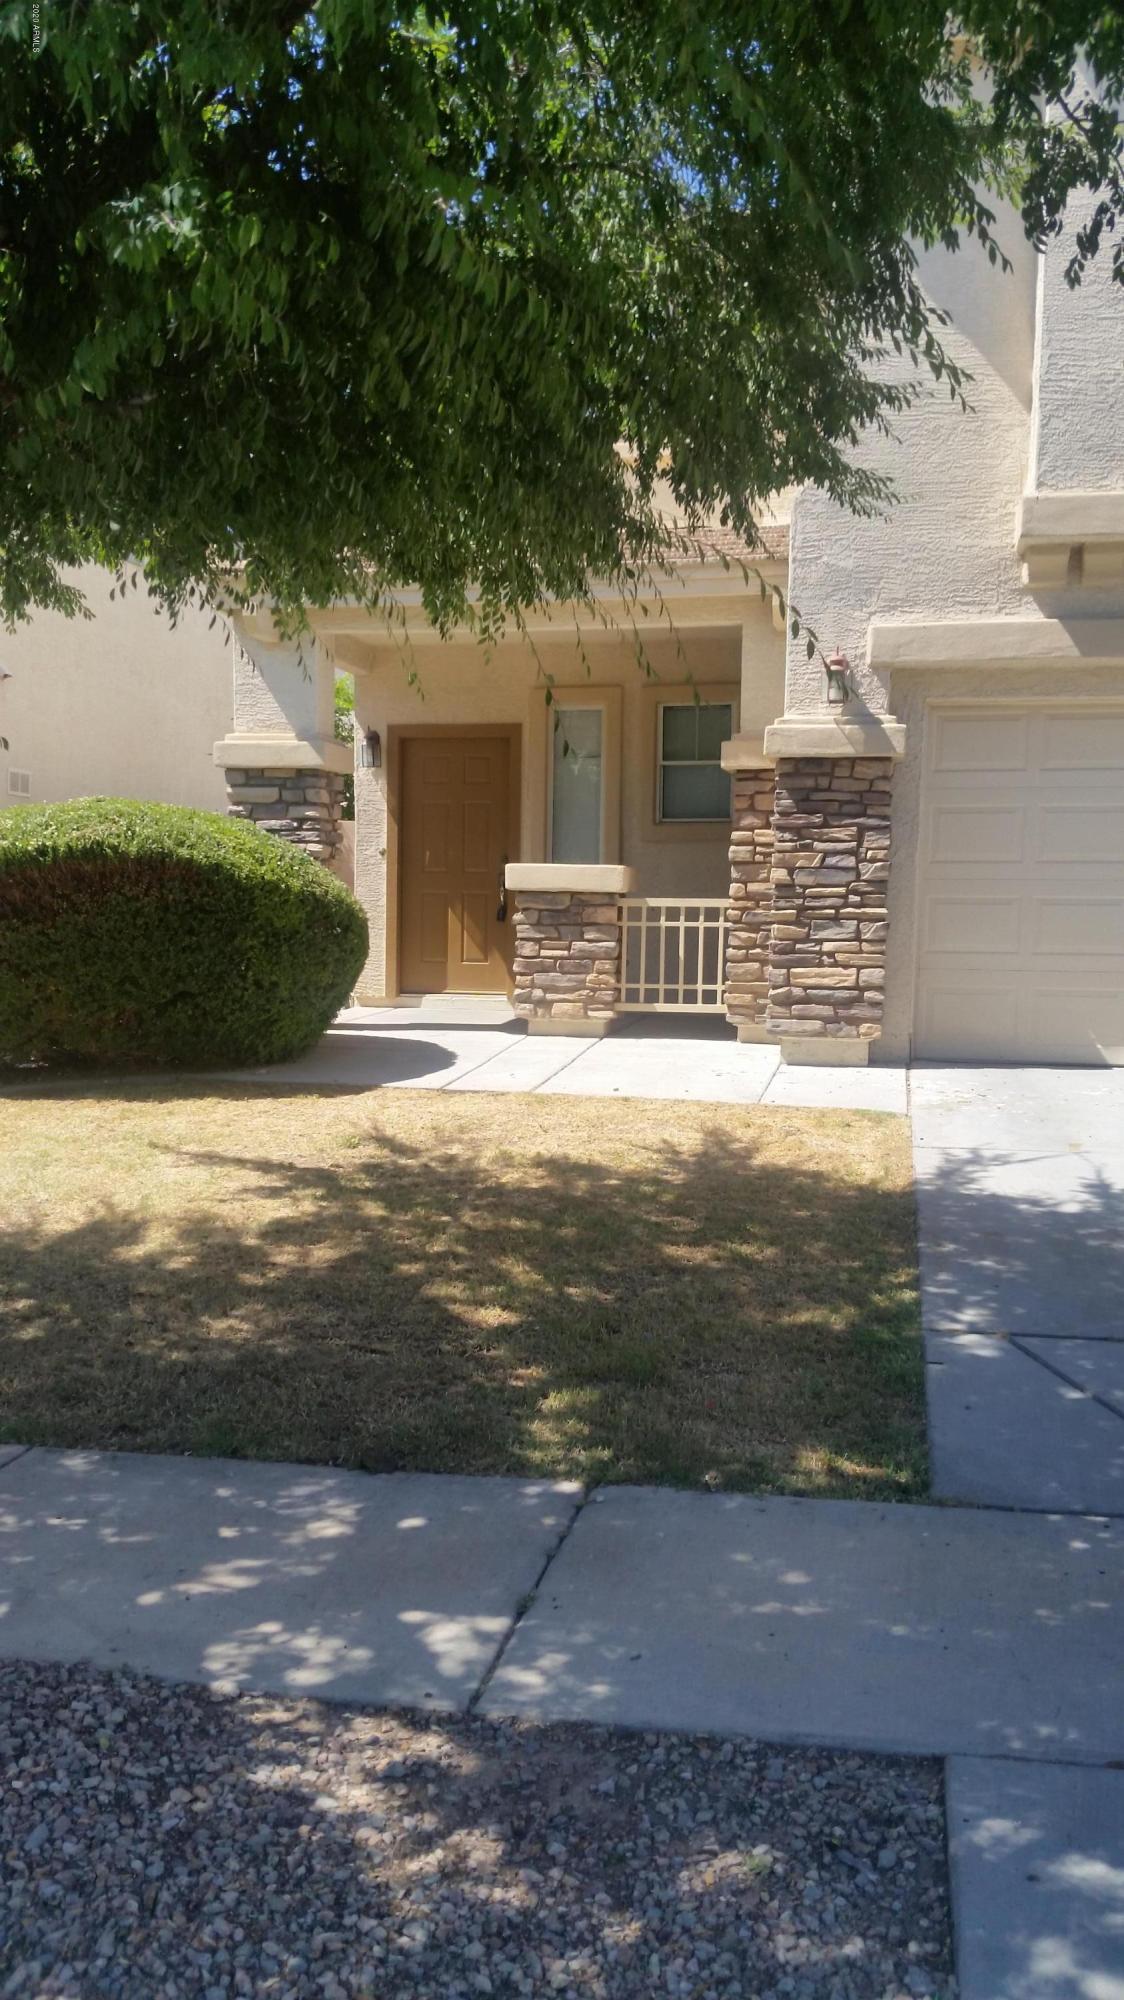 MLS 6079414 12180 W YUMA Street, Avondale, AZ 85323